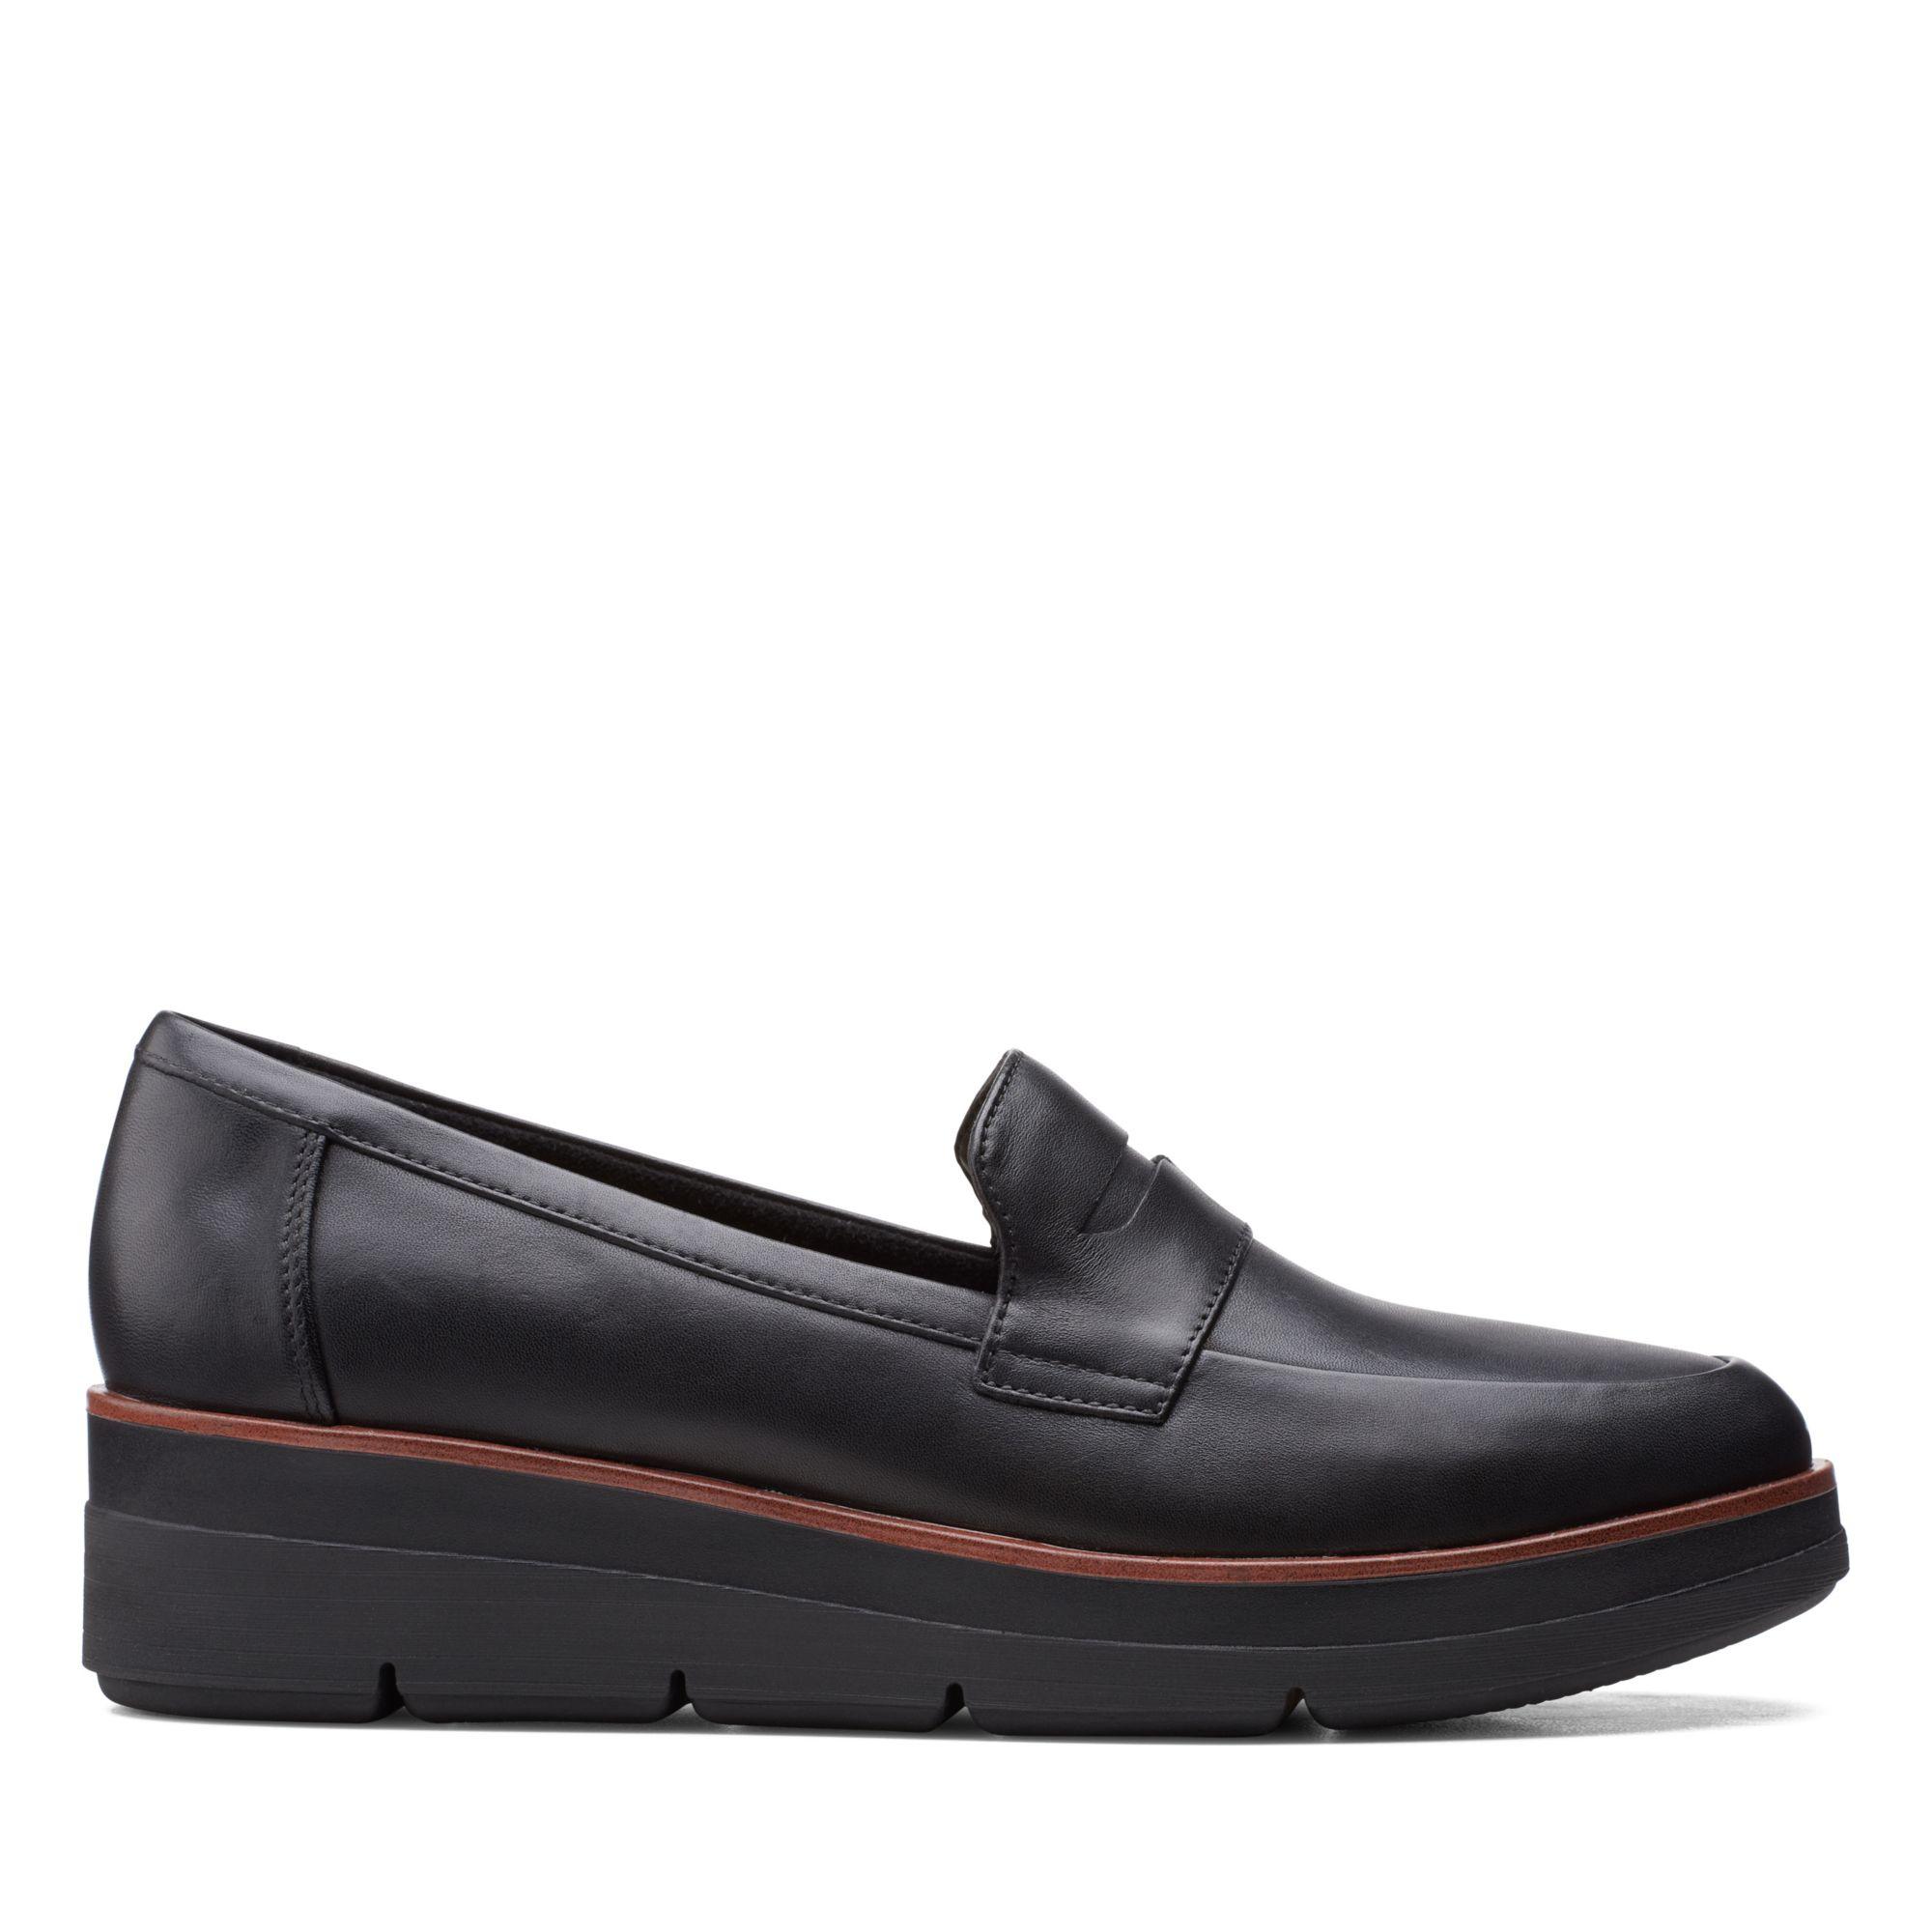 Clarks Shaylin Step – Leather